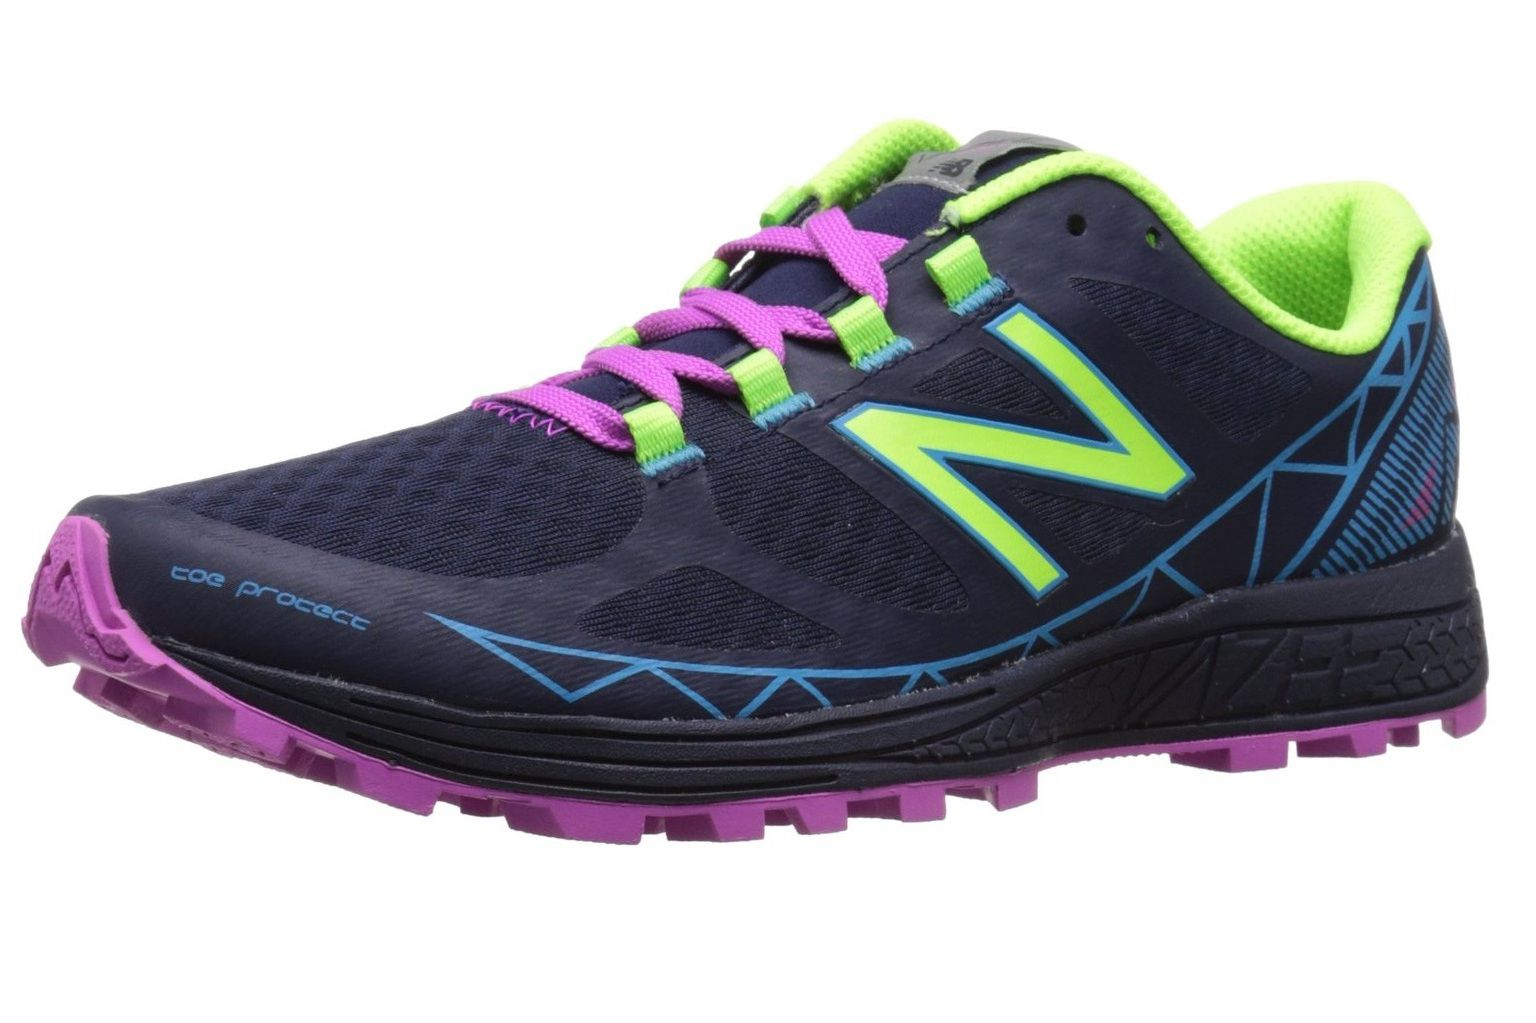 New Balance Vazee Summit Trail Shoe